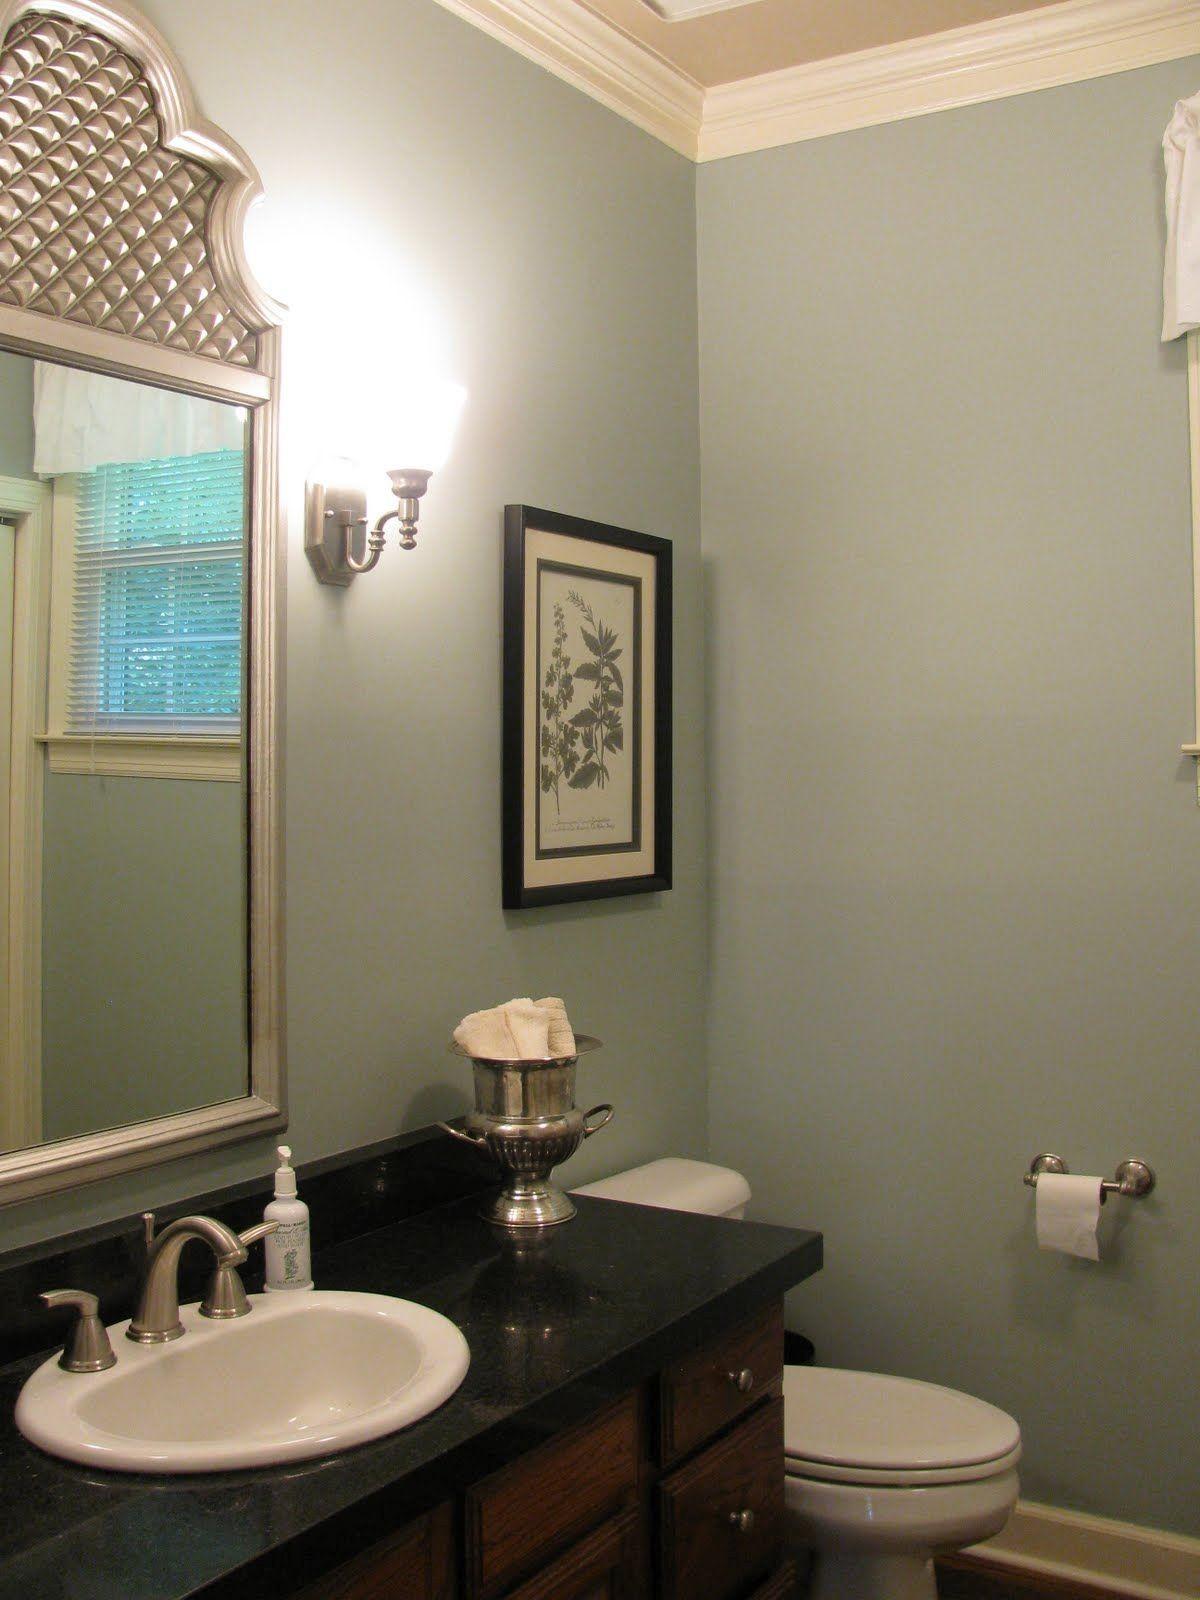 Sherwin Williams Bathroom Paint Terrific My Favorite Color Of All Time Silvermist Décor